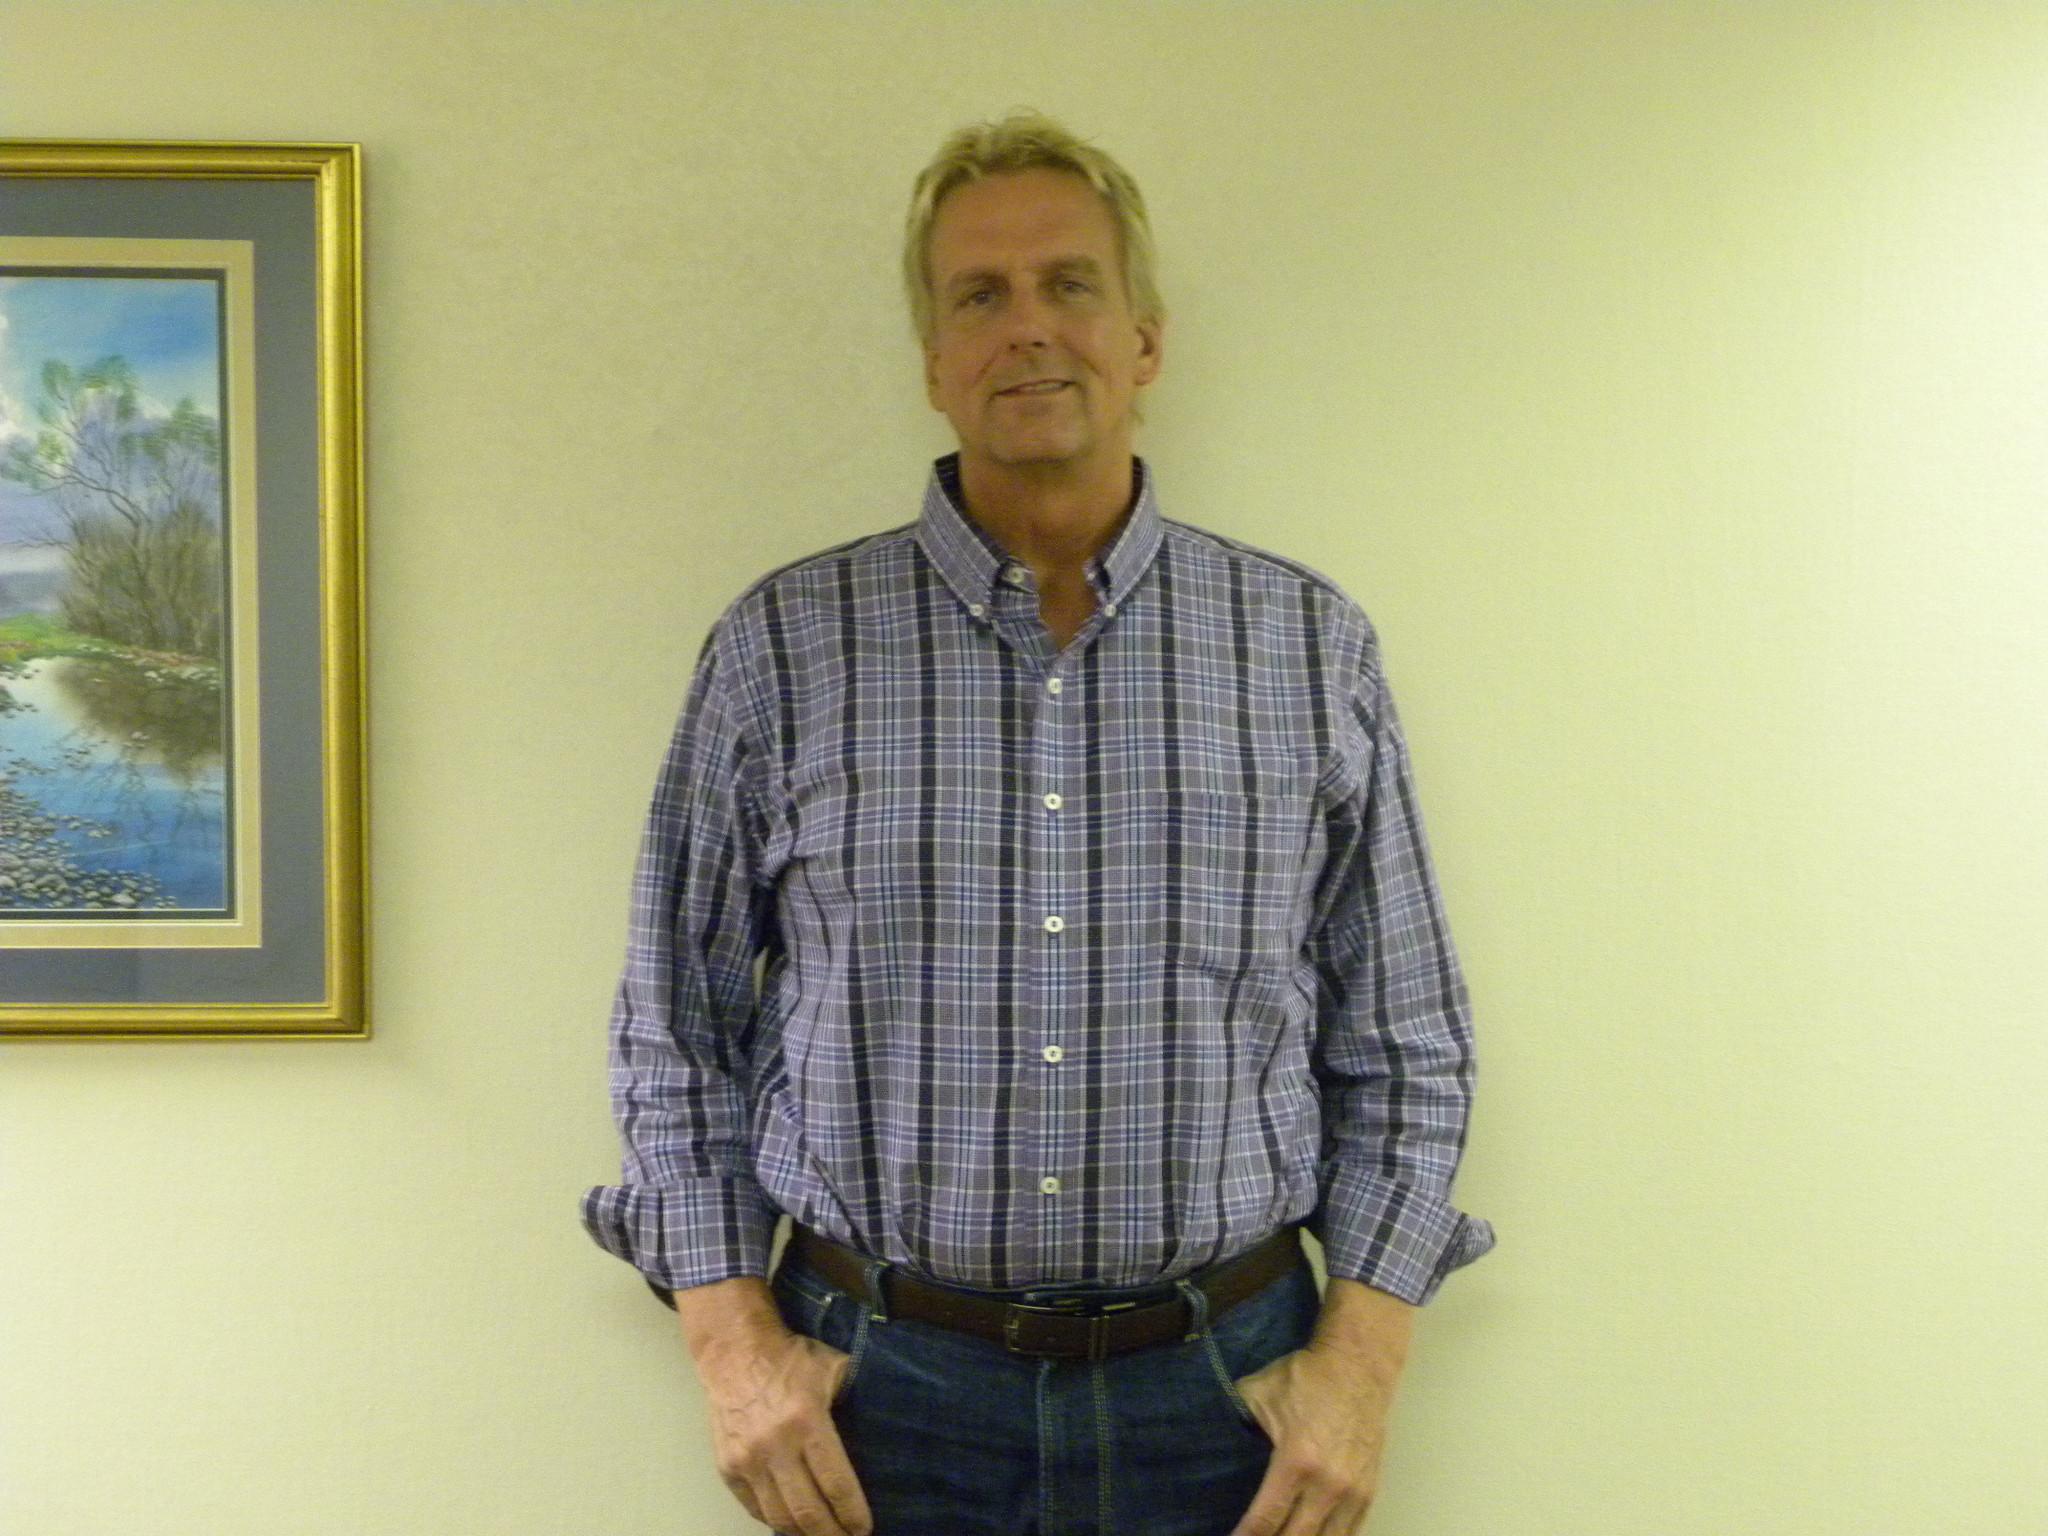 Cardiomyopathy-Mitchell Speck's Story